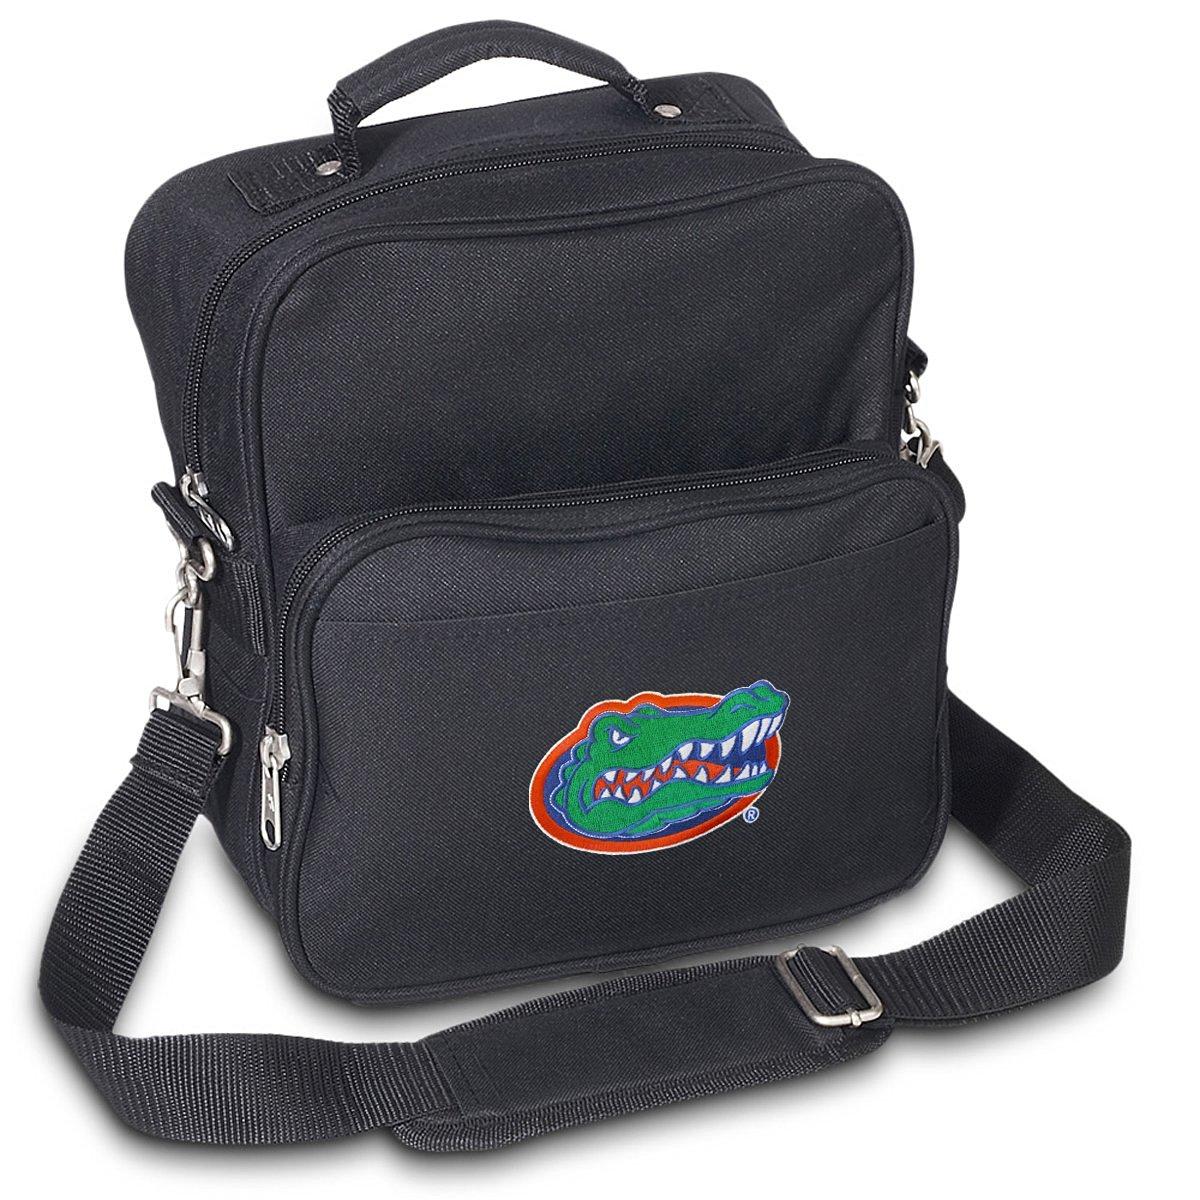 University of Florida Travel Bag or Small Crossbody Day Pack Shoulder Bag